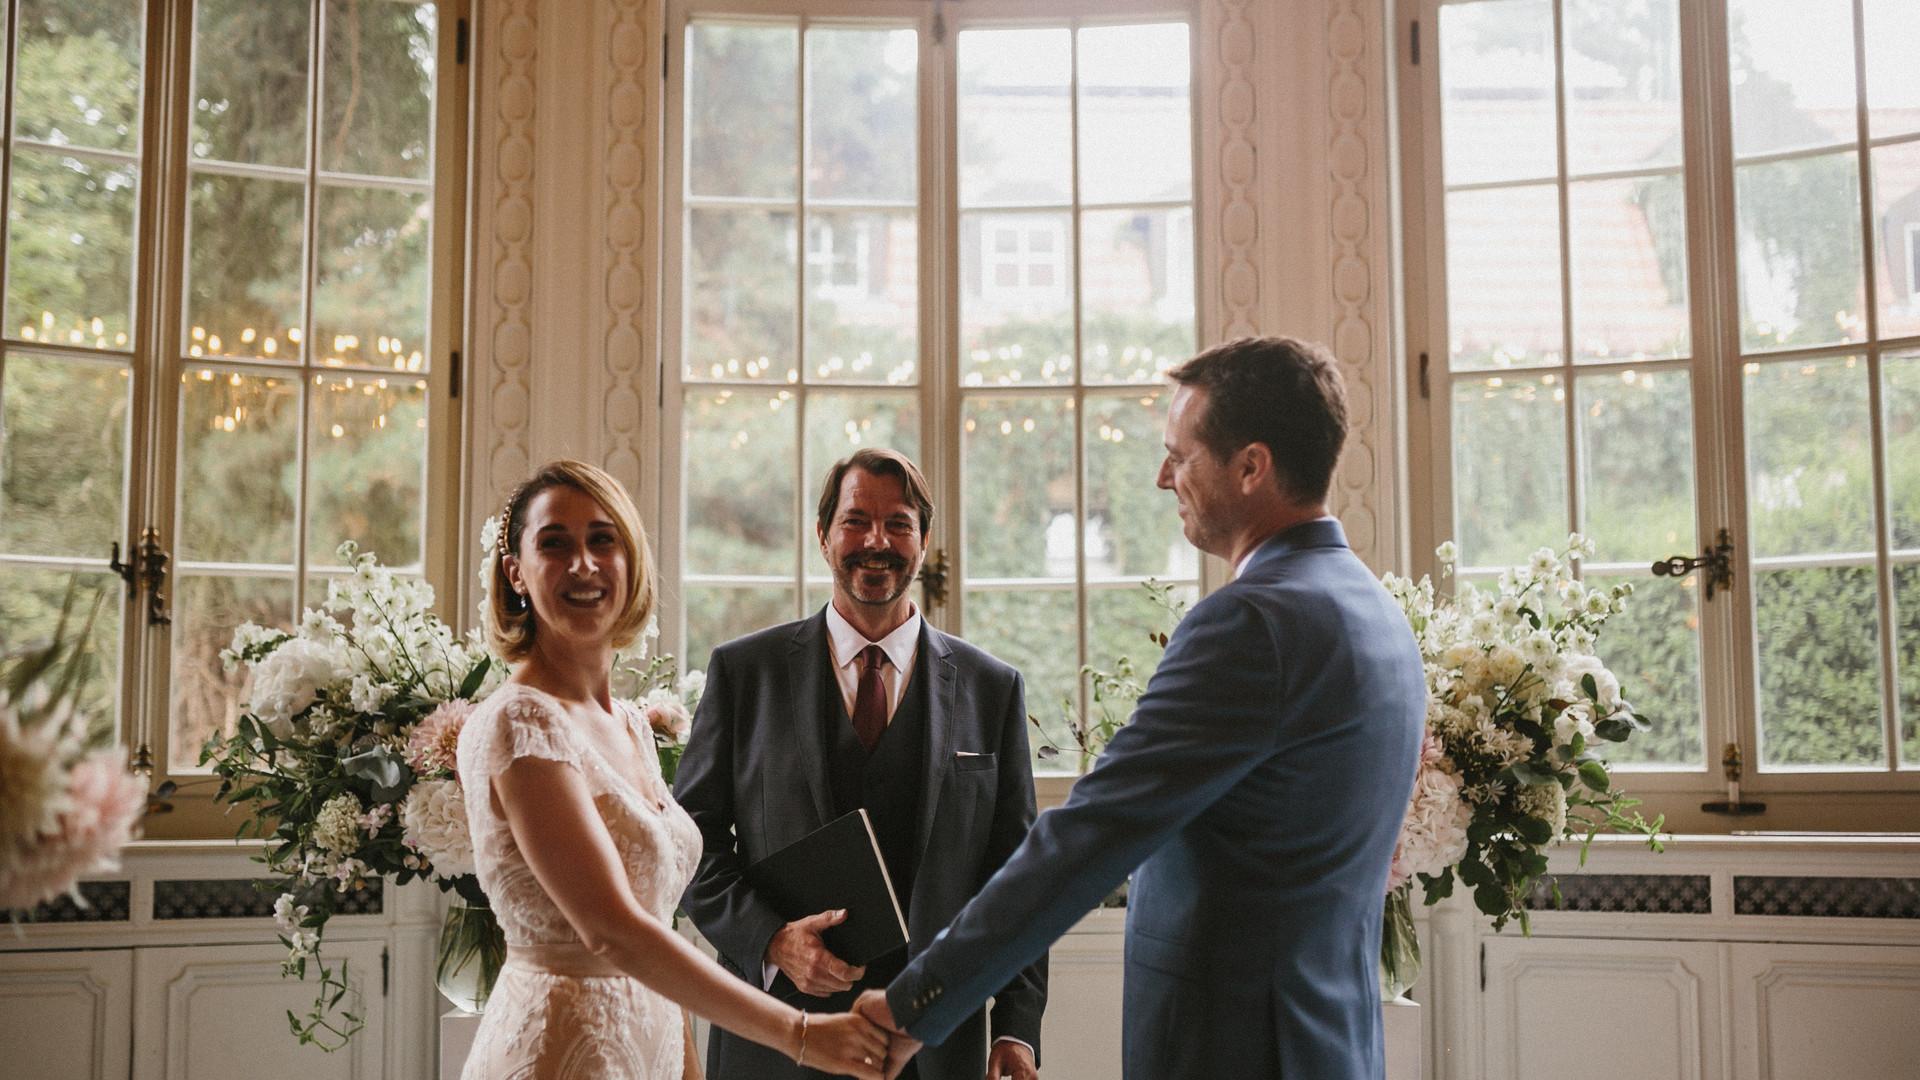 Berlin wedding